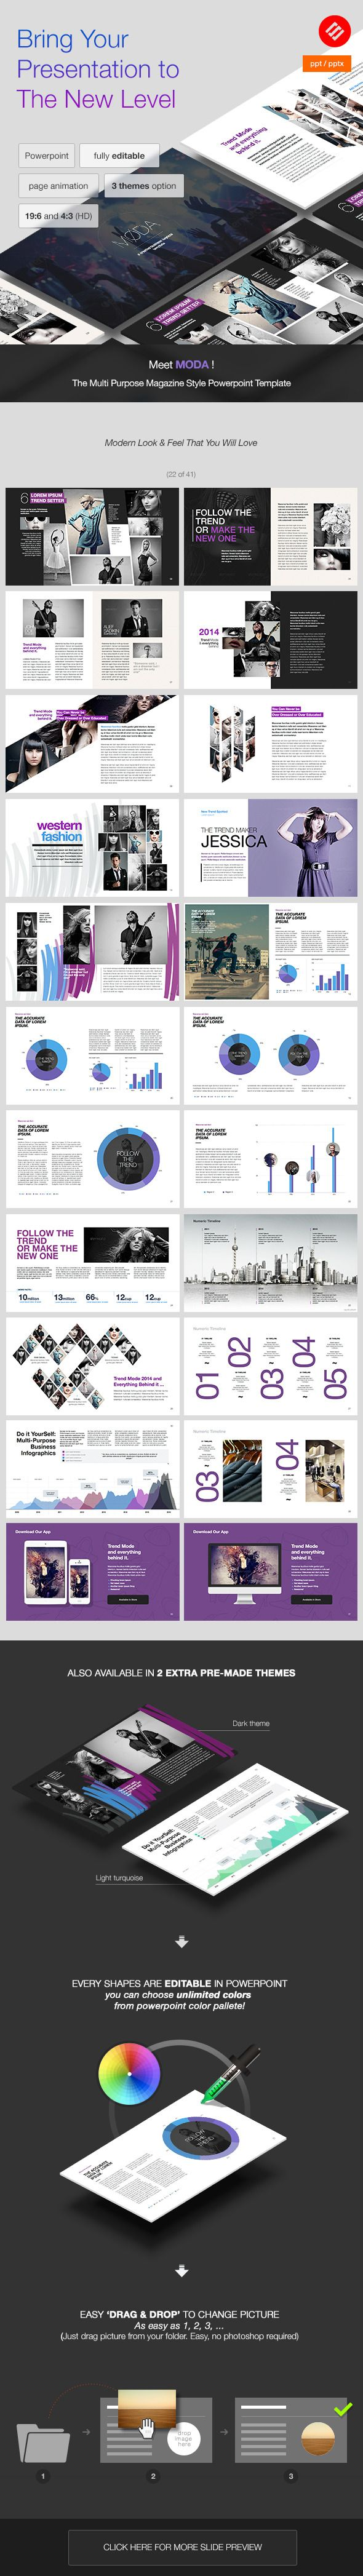 MODA - Modern Powerpoint Template | Präsentation, Portfolio Ideen ...